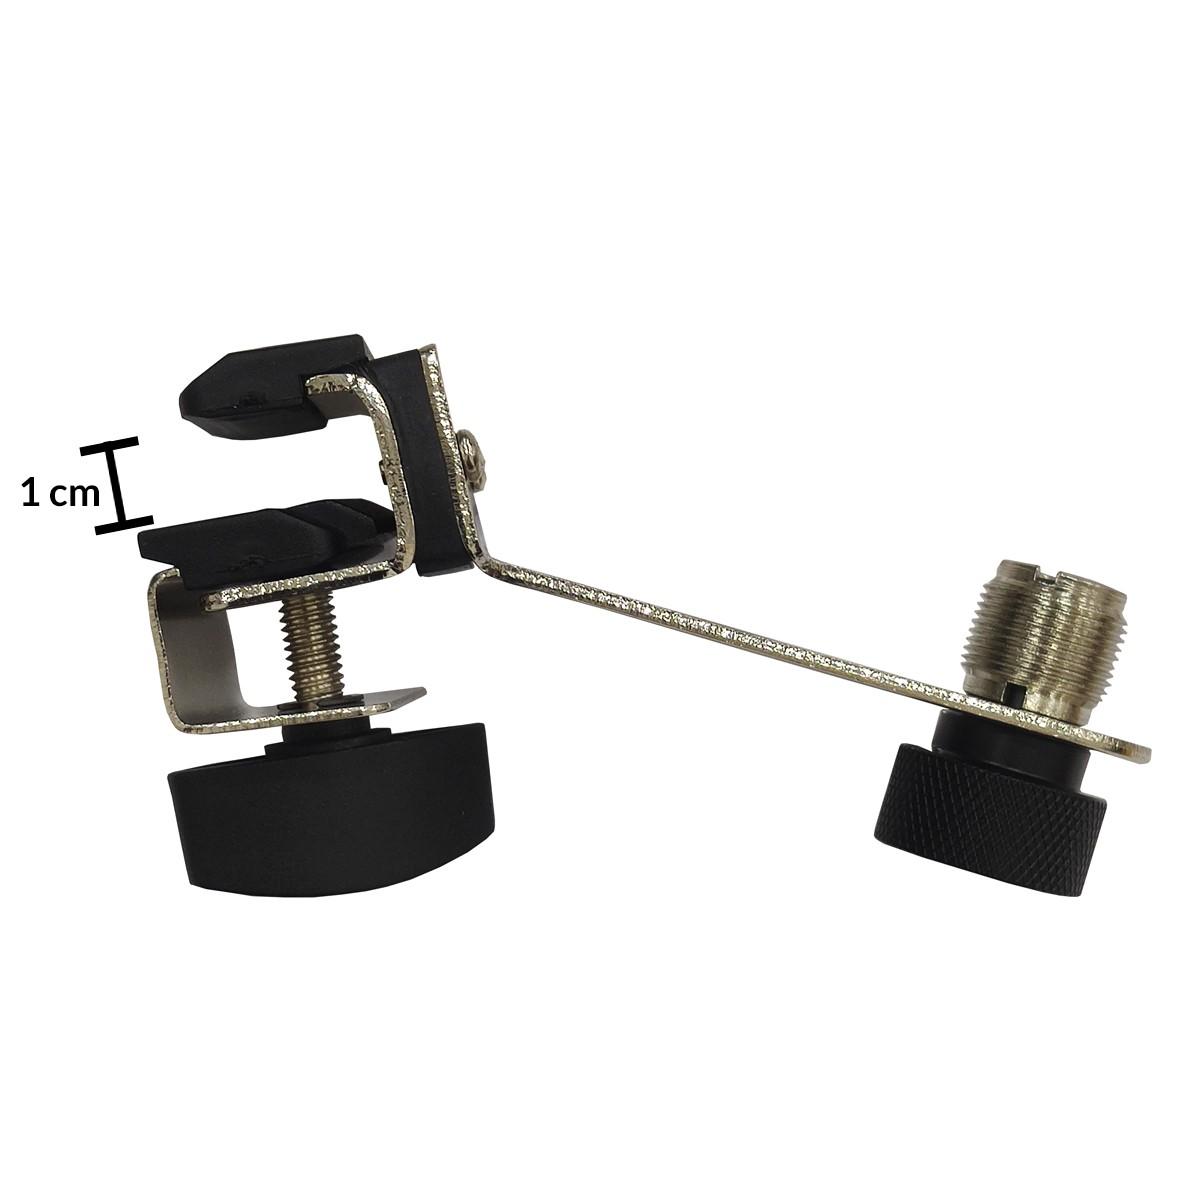 Garra Clamp Para Microfone De Bateria Sdh-031 - Csr  - RS Som e Luz!